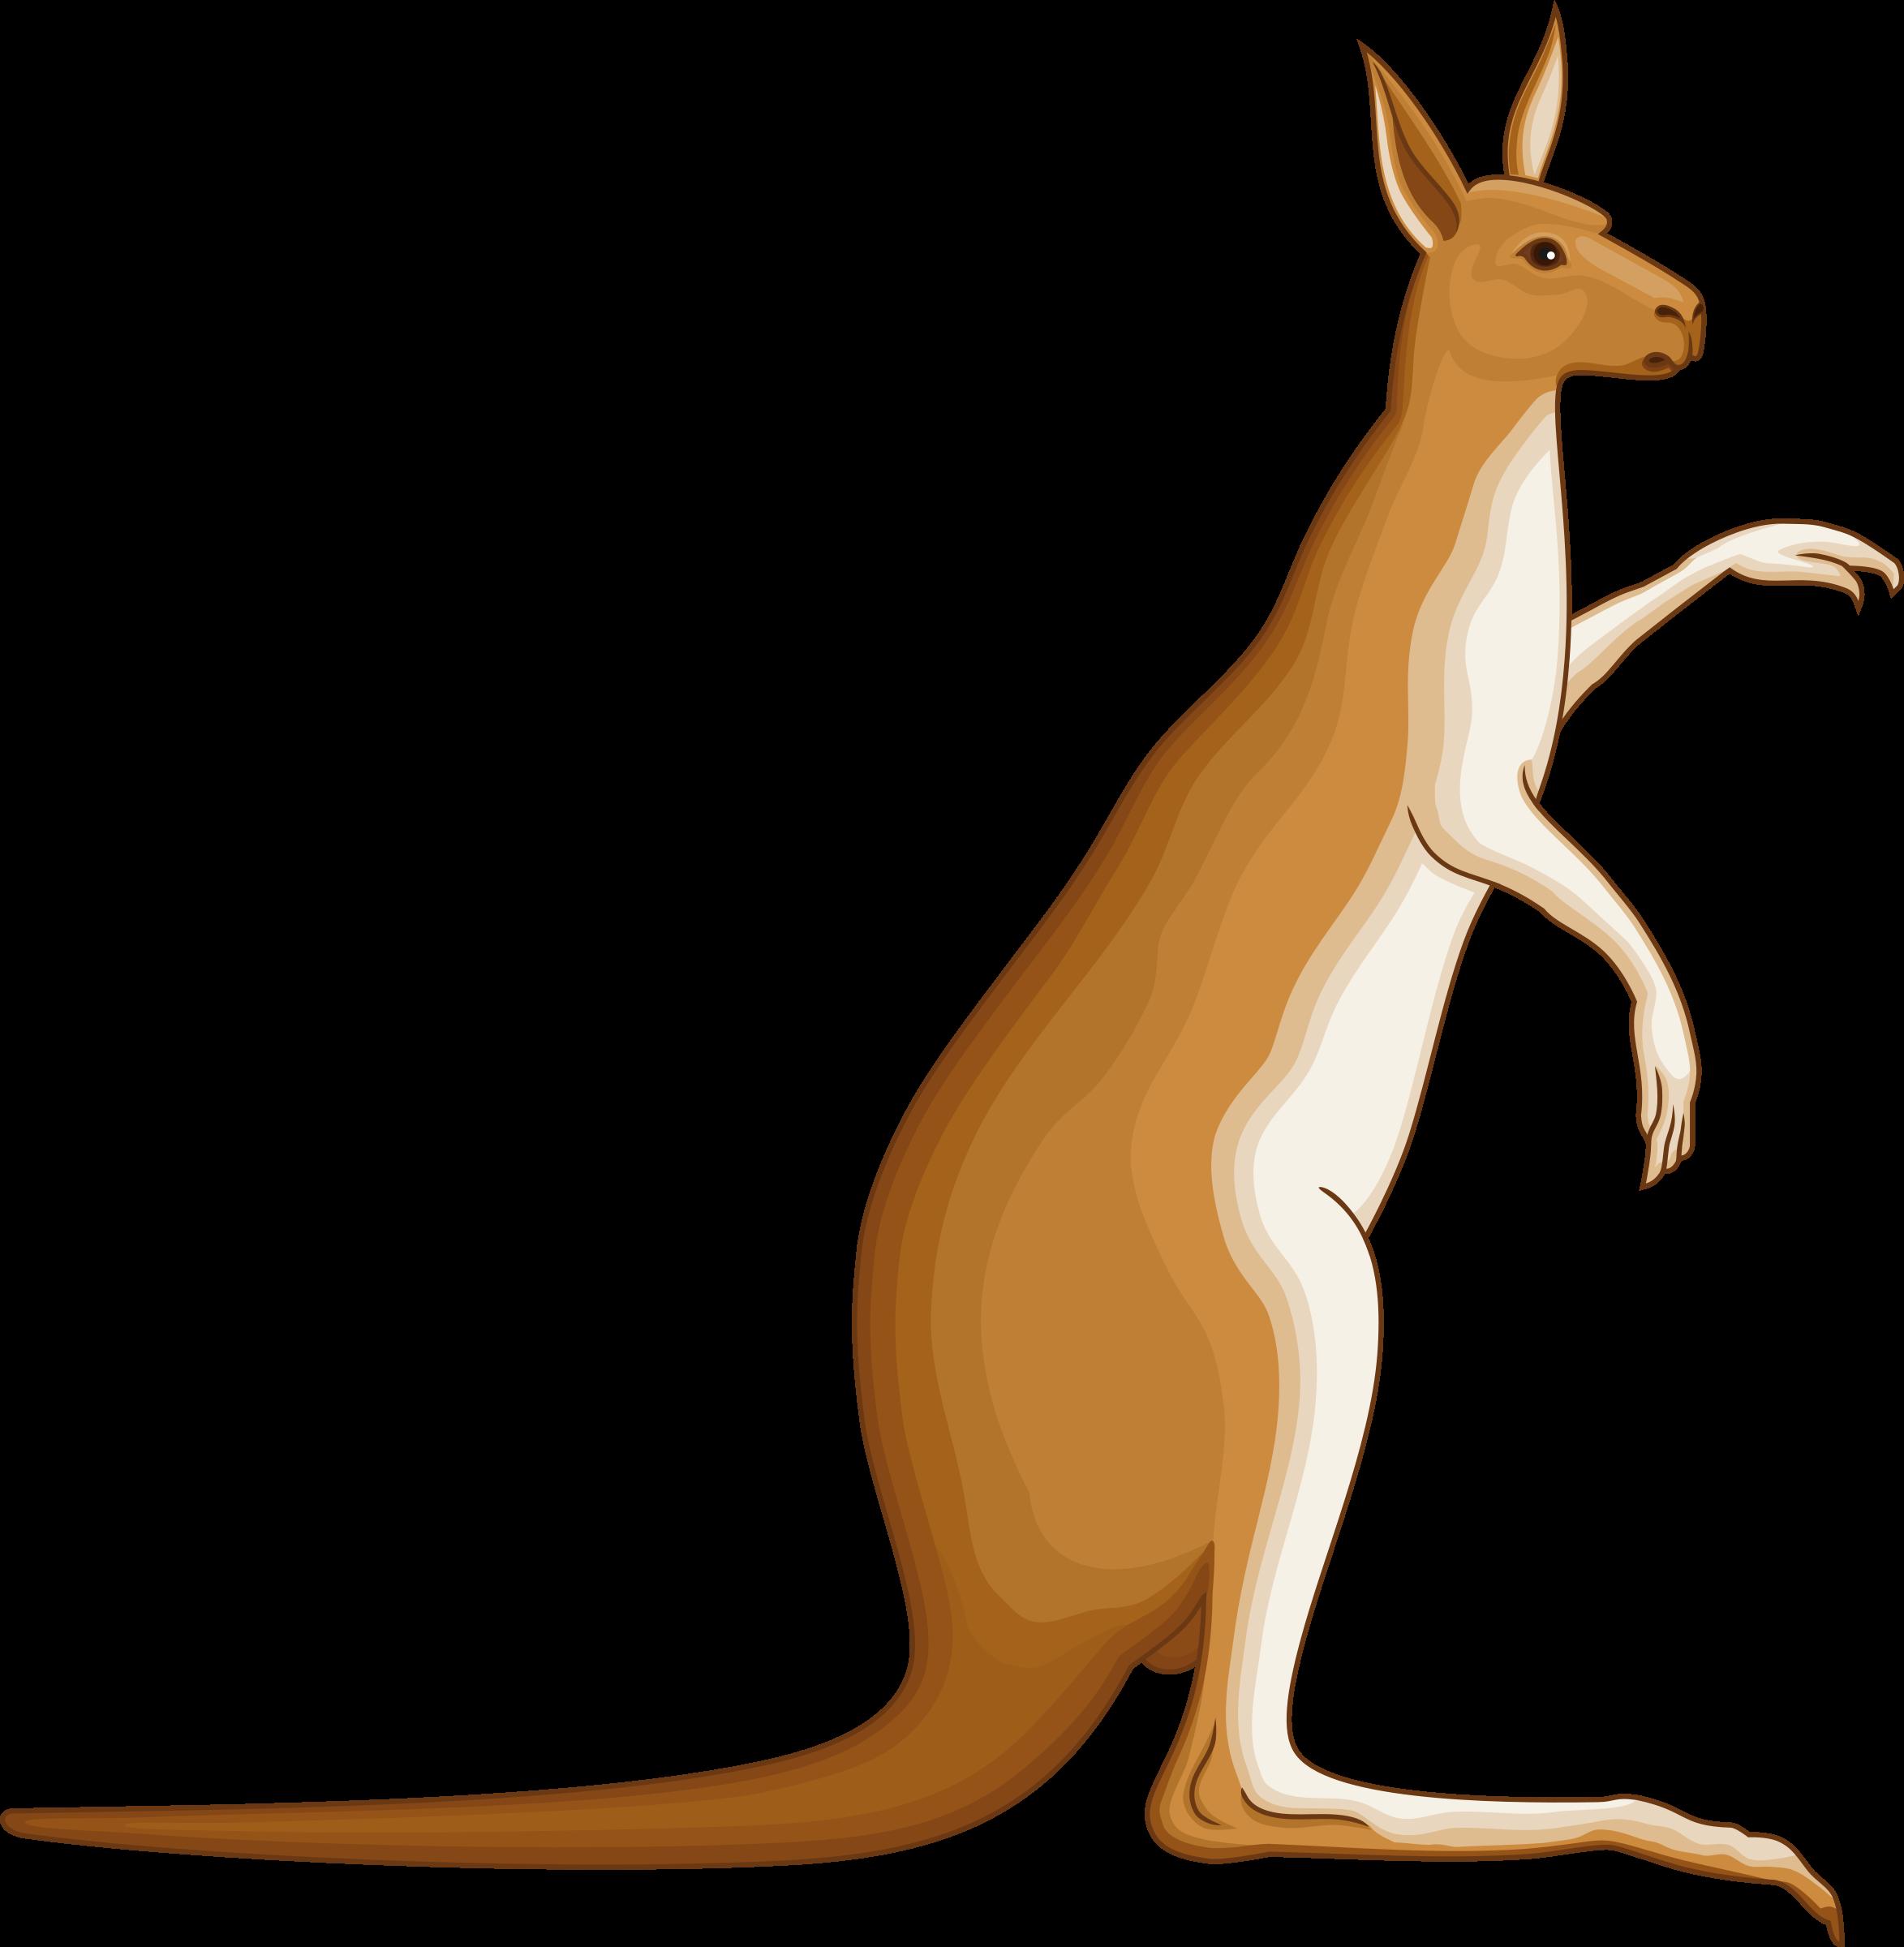 clip transparent library Clipart kangaroo. Big image png.